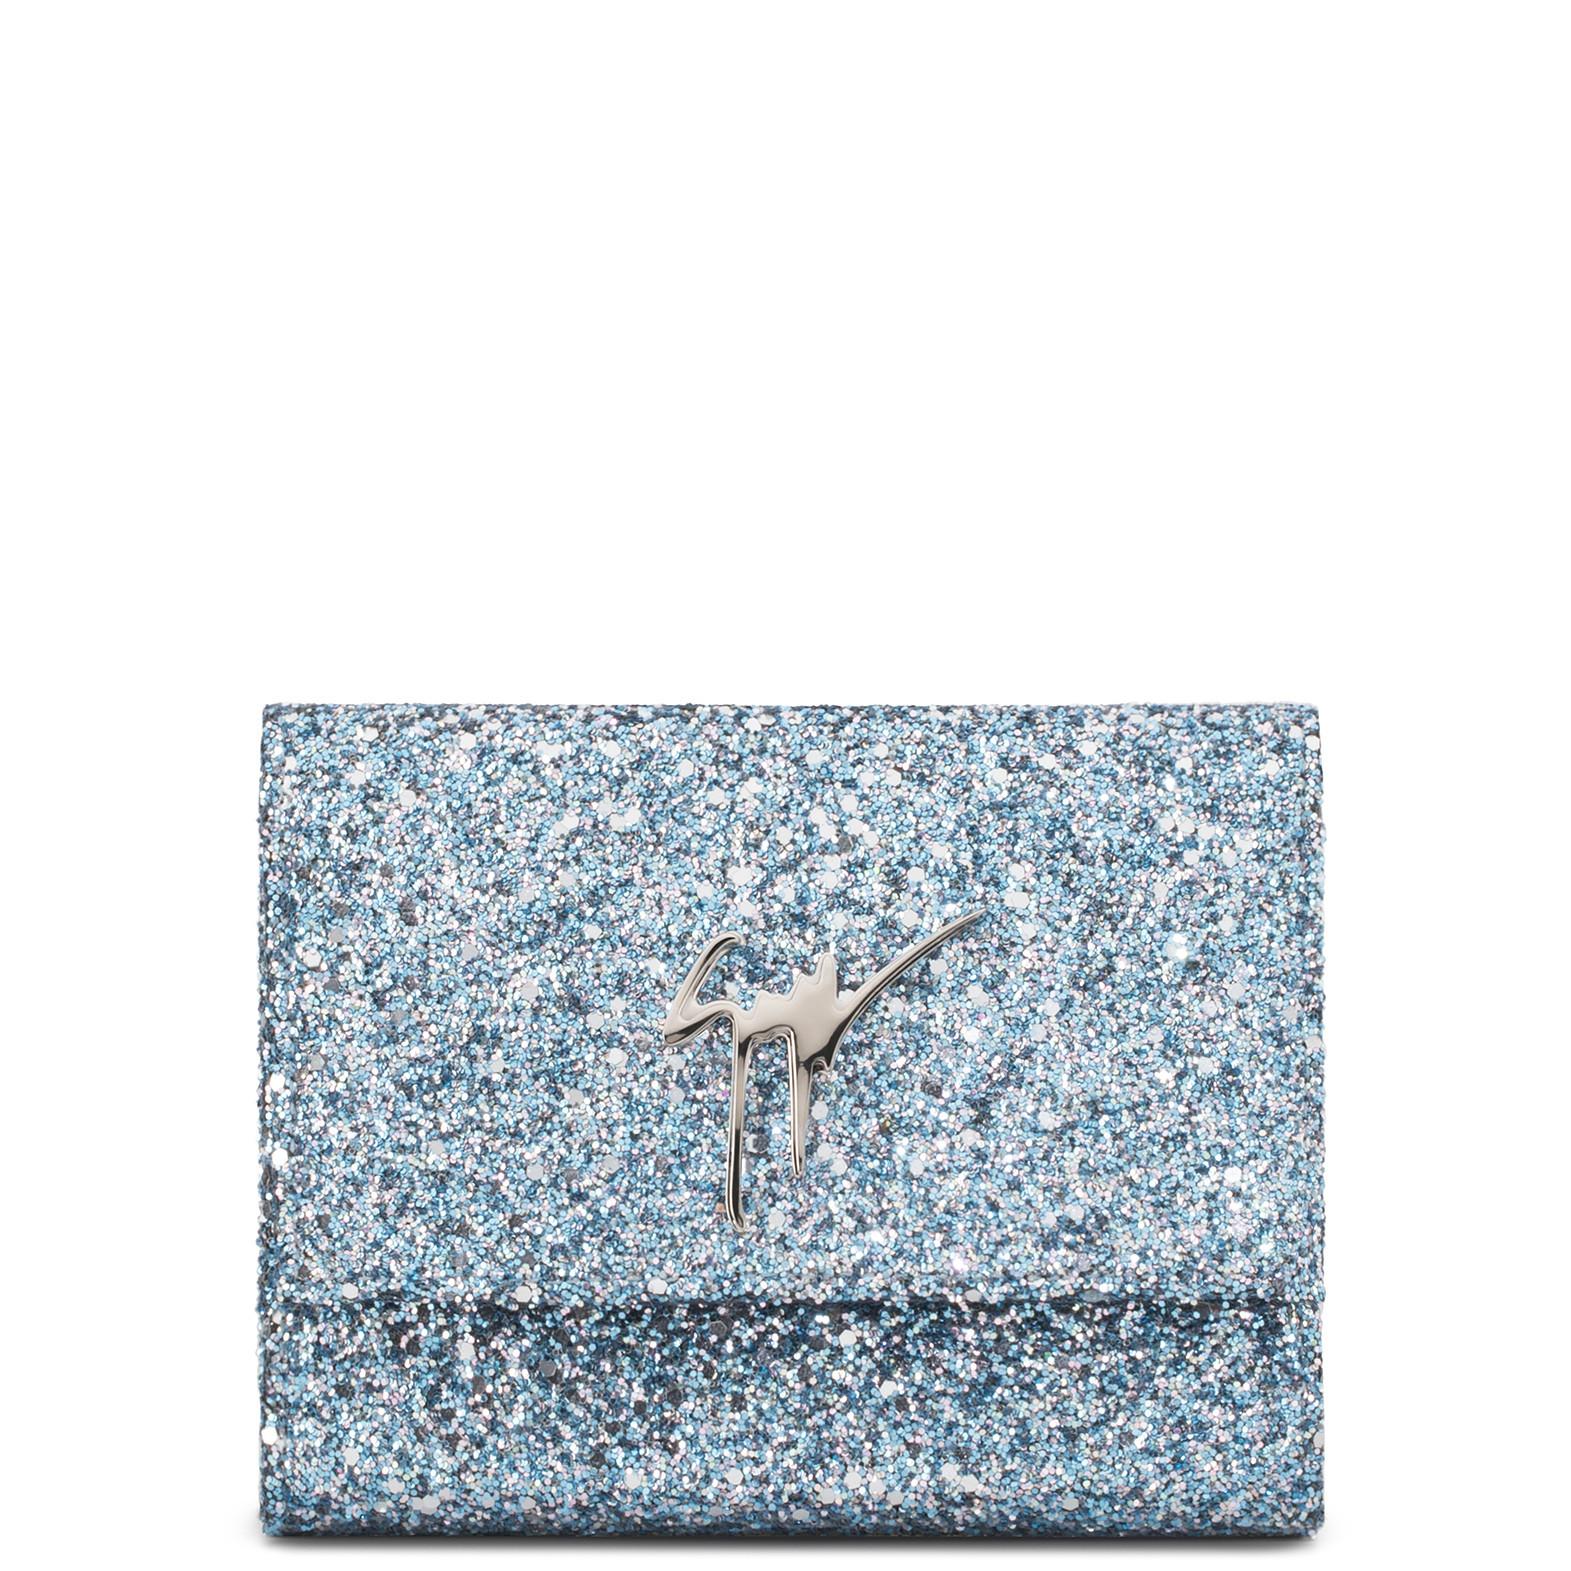 Giuseppe Zanotti - 165x125 Mm Blue Glitter Fabric Clutch Merry Sparkle